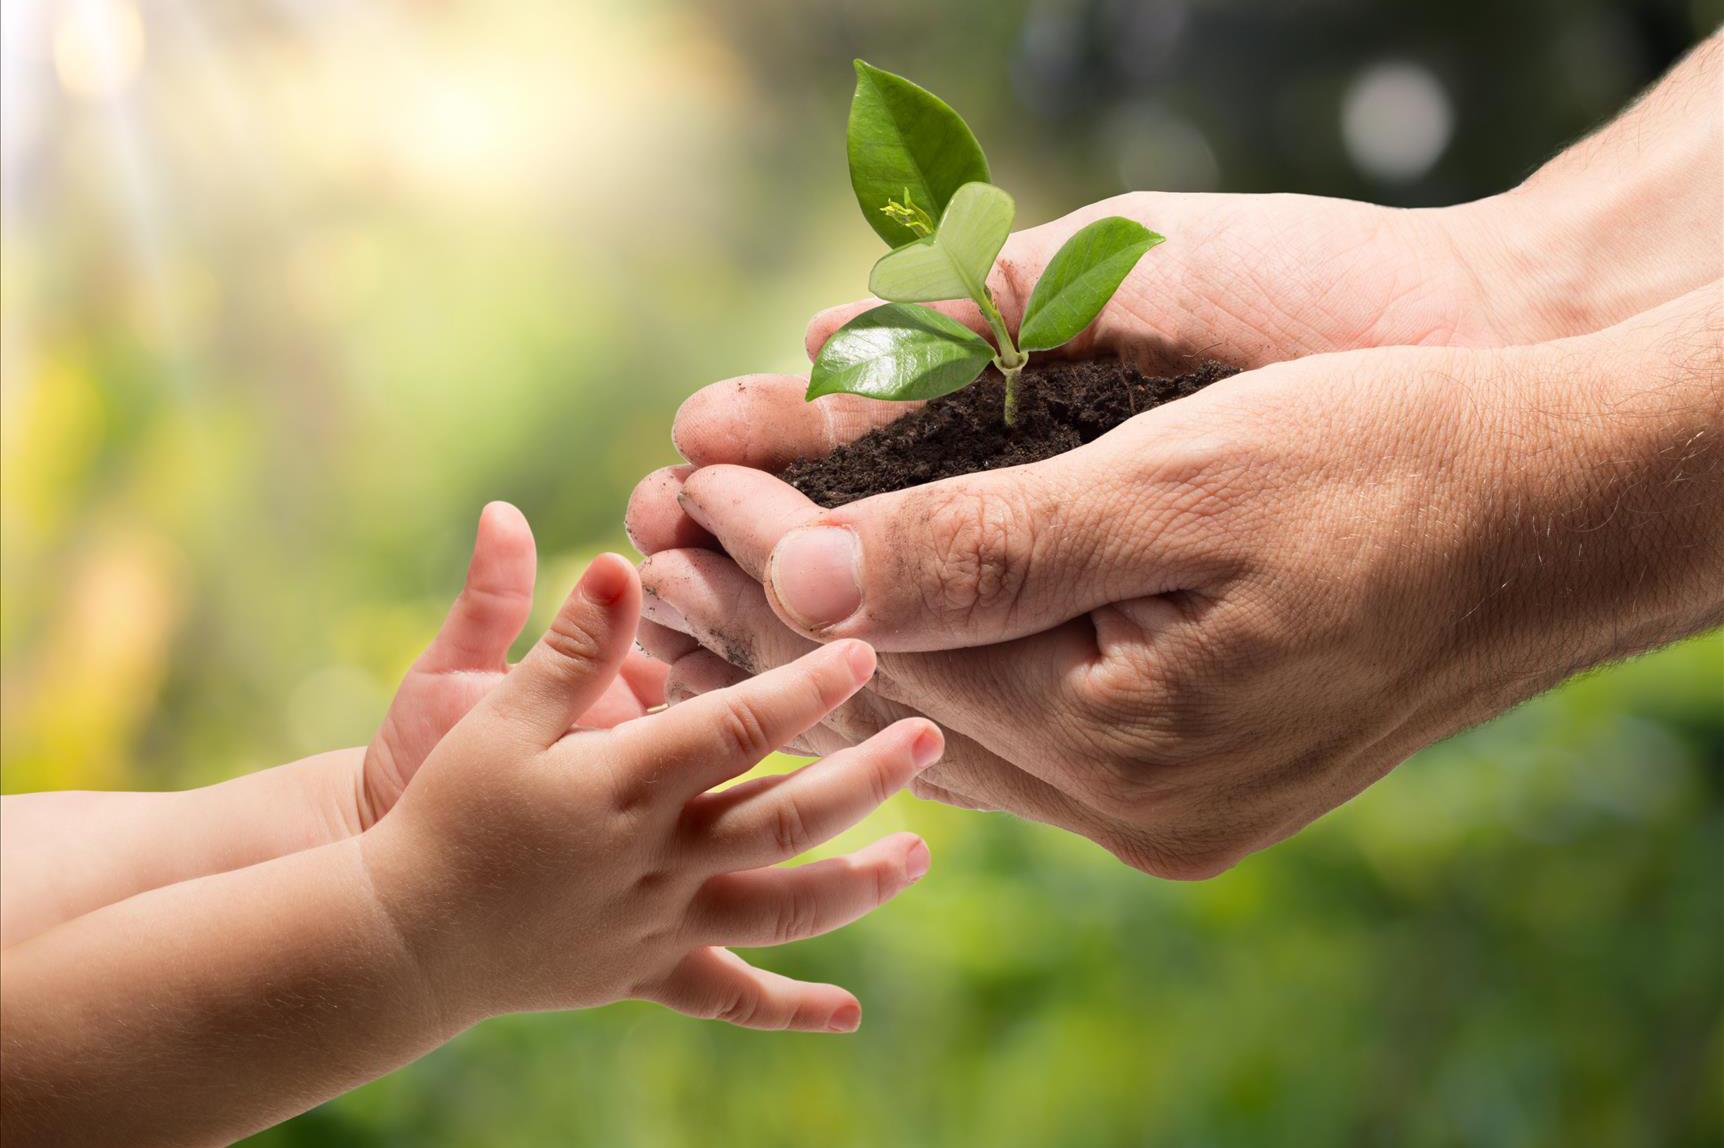 teaching-children-about-environment